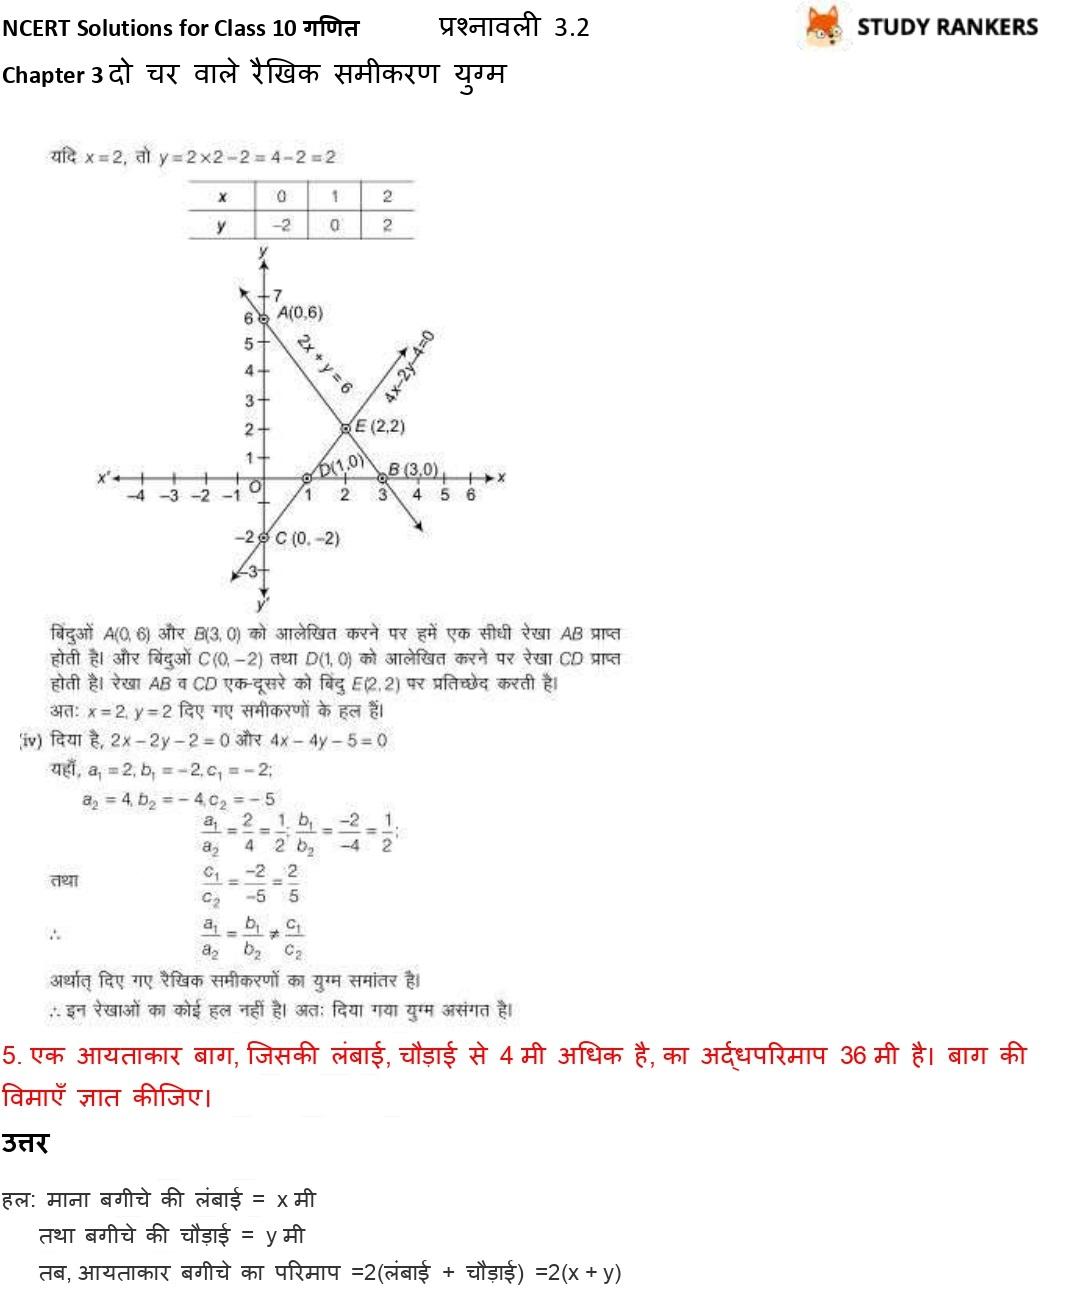 NCERT Solutions for Class 10 Maths Chapter 3 दो चर वाले रैखिक समीकरण युग्म प्रश्नावली 3.2 Part 9